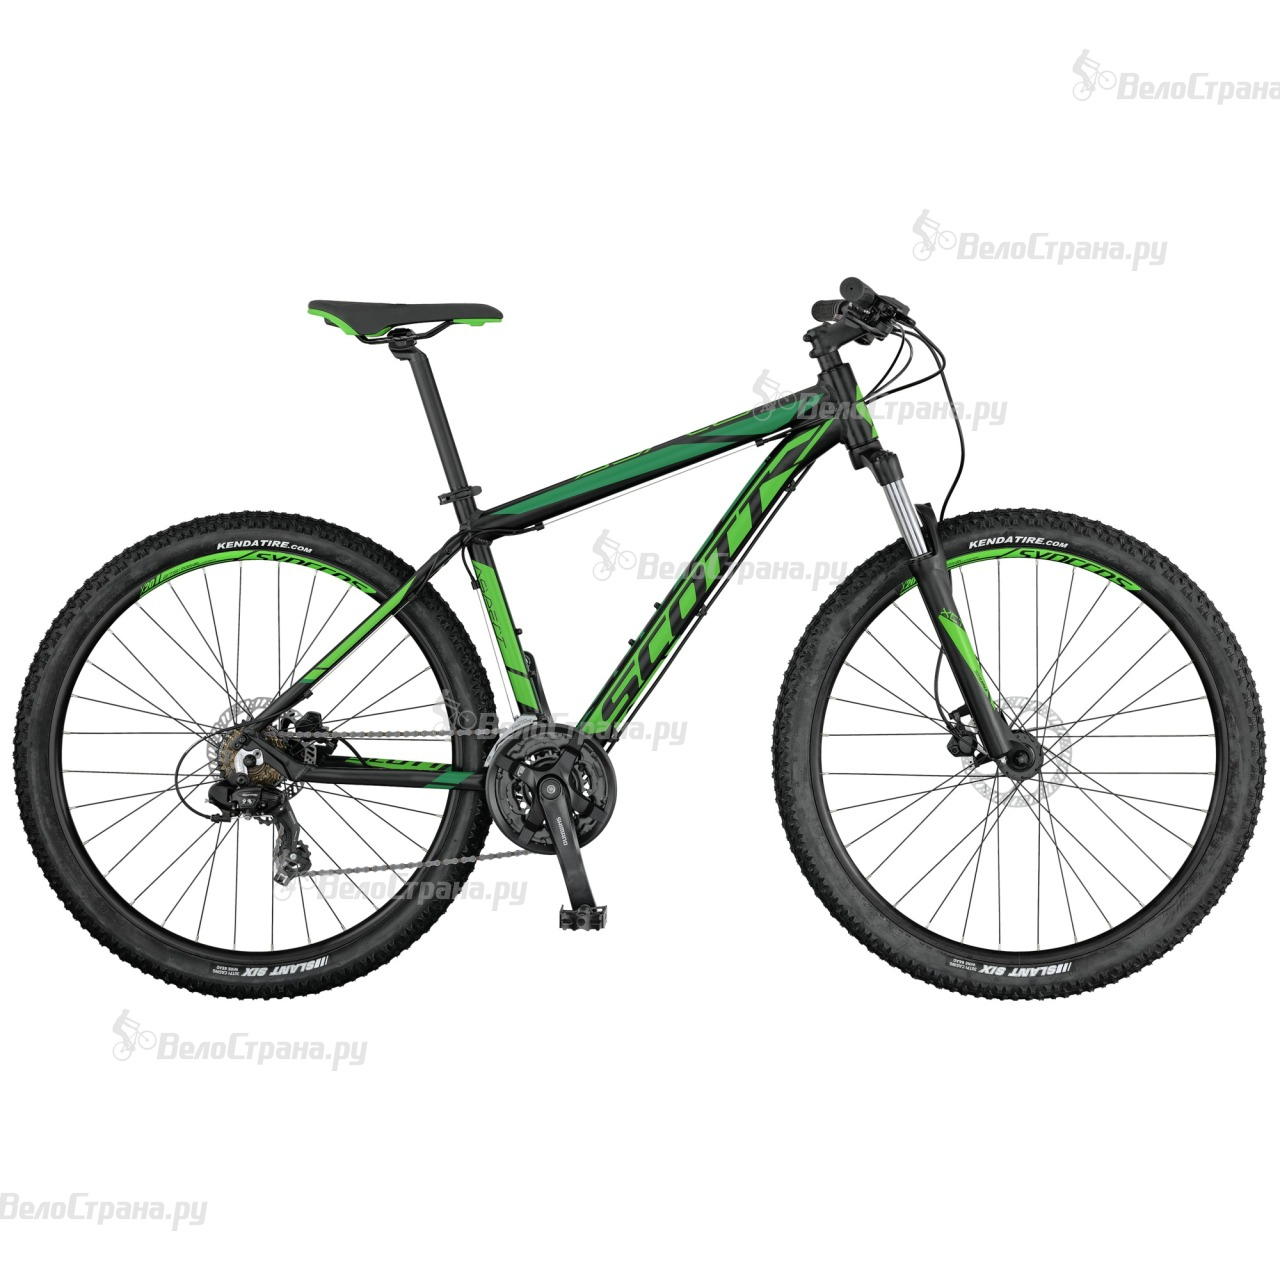 Велосипед Scott Aspect 760 (2017)